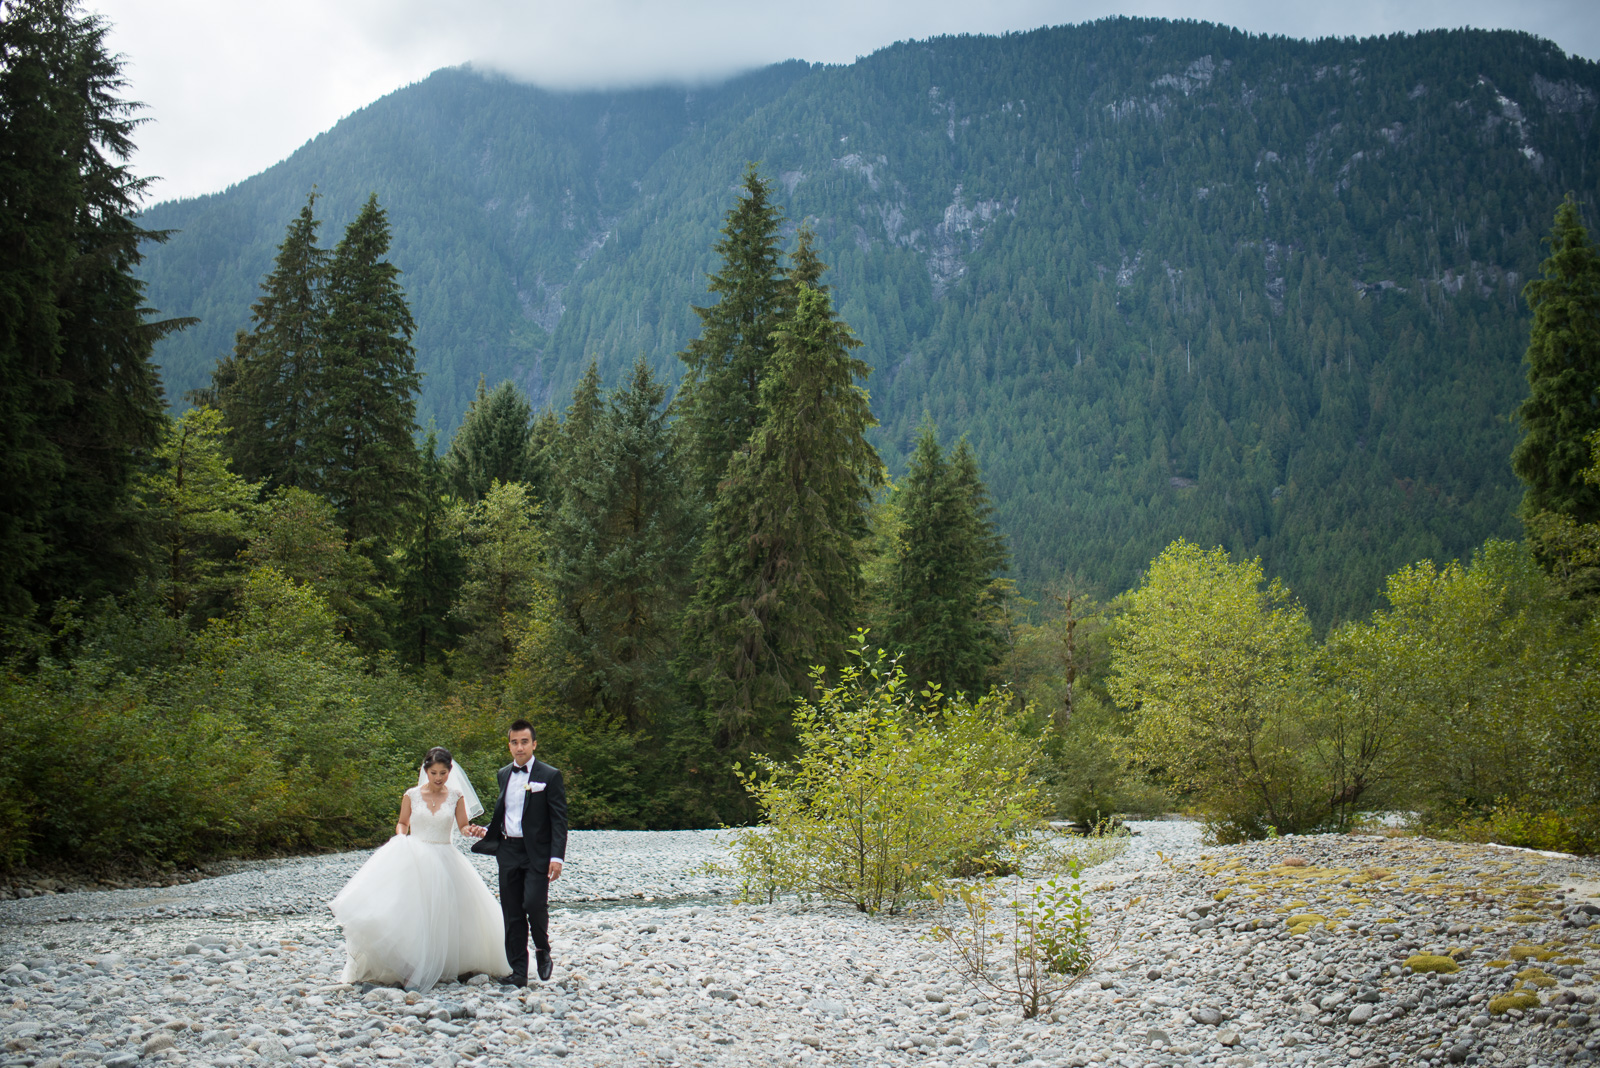 vancouver-island-wedding-photographers-golden-eagle-golf-course-wedding-27.jpg